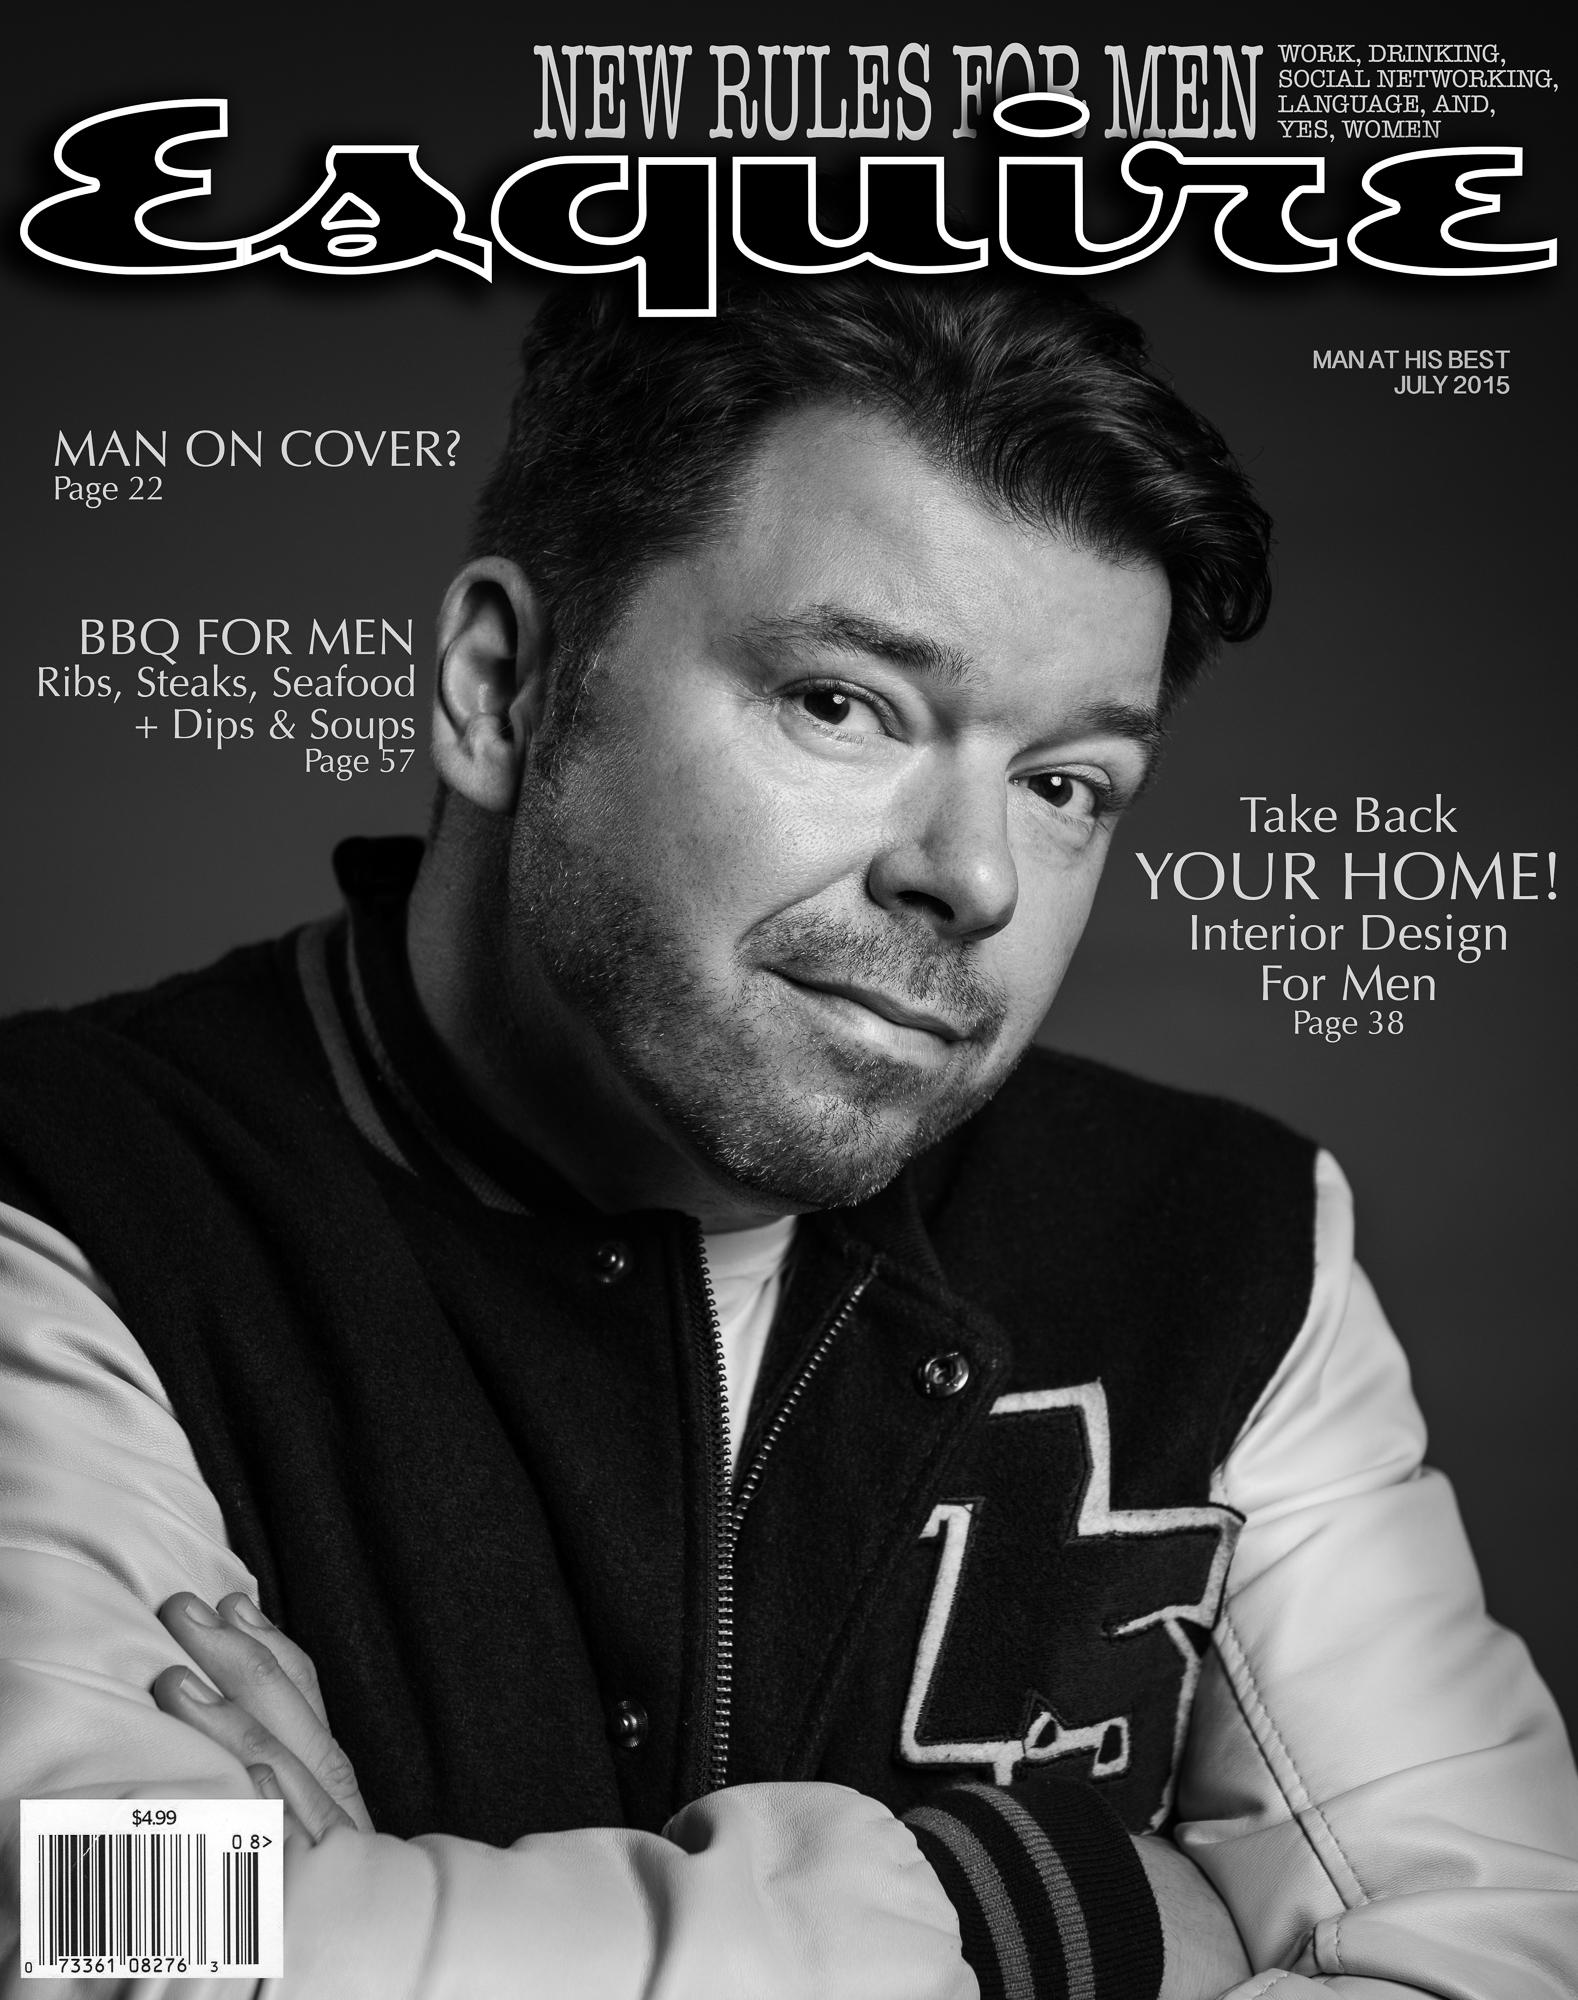 Esquire-Cover02.jpg